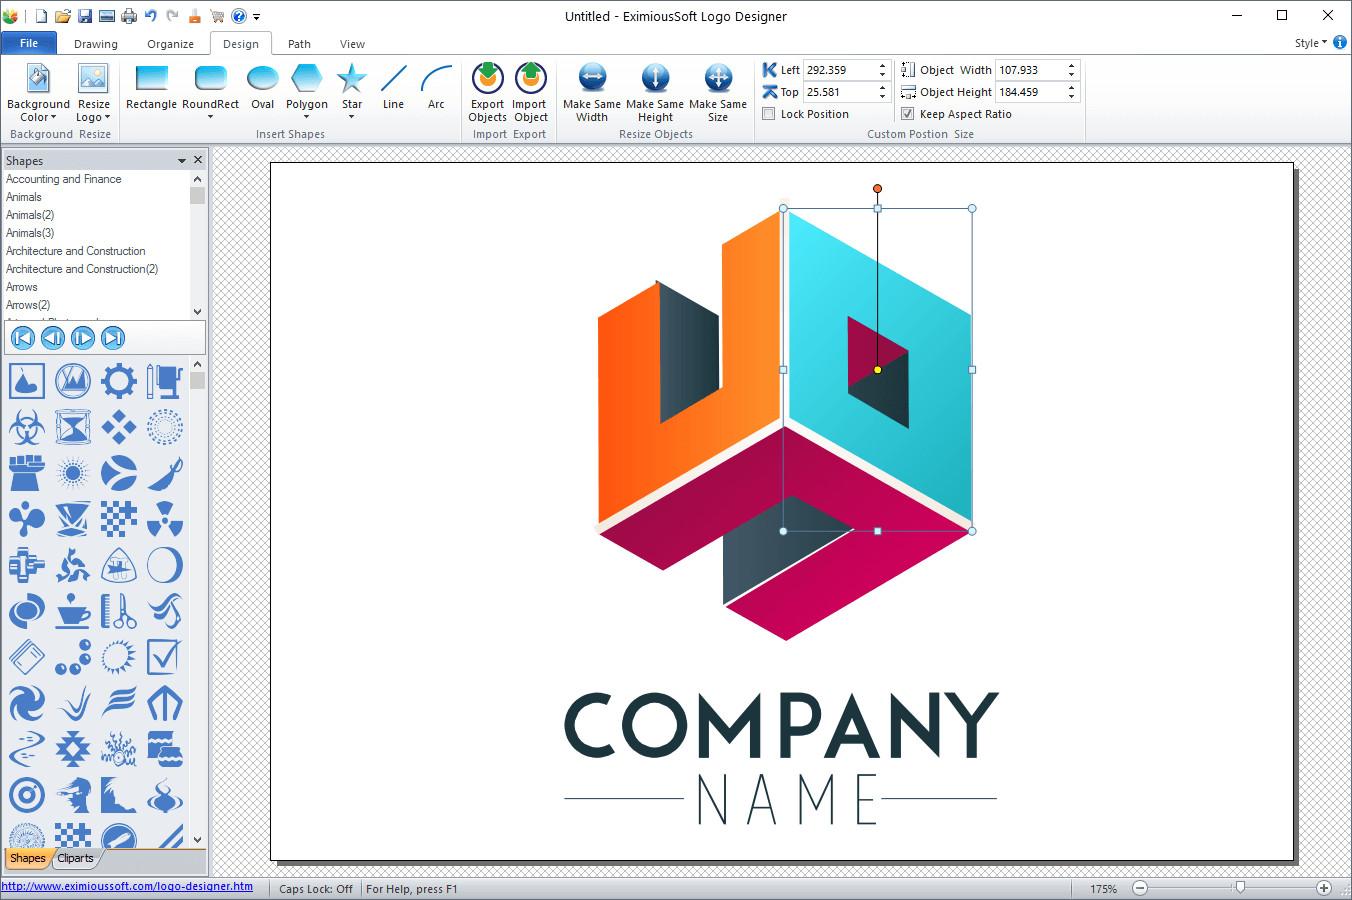 Eximioussoft logo designer pro neowin for Logo drawing program